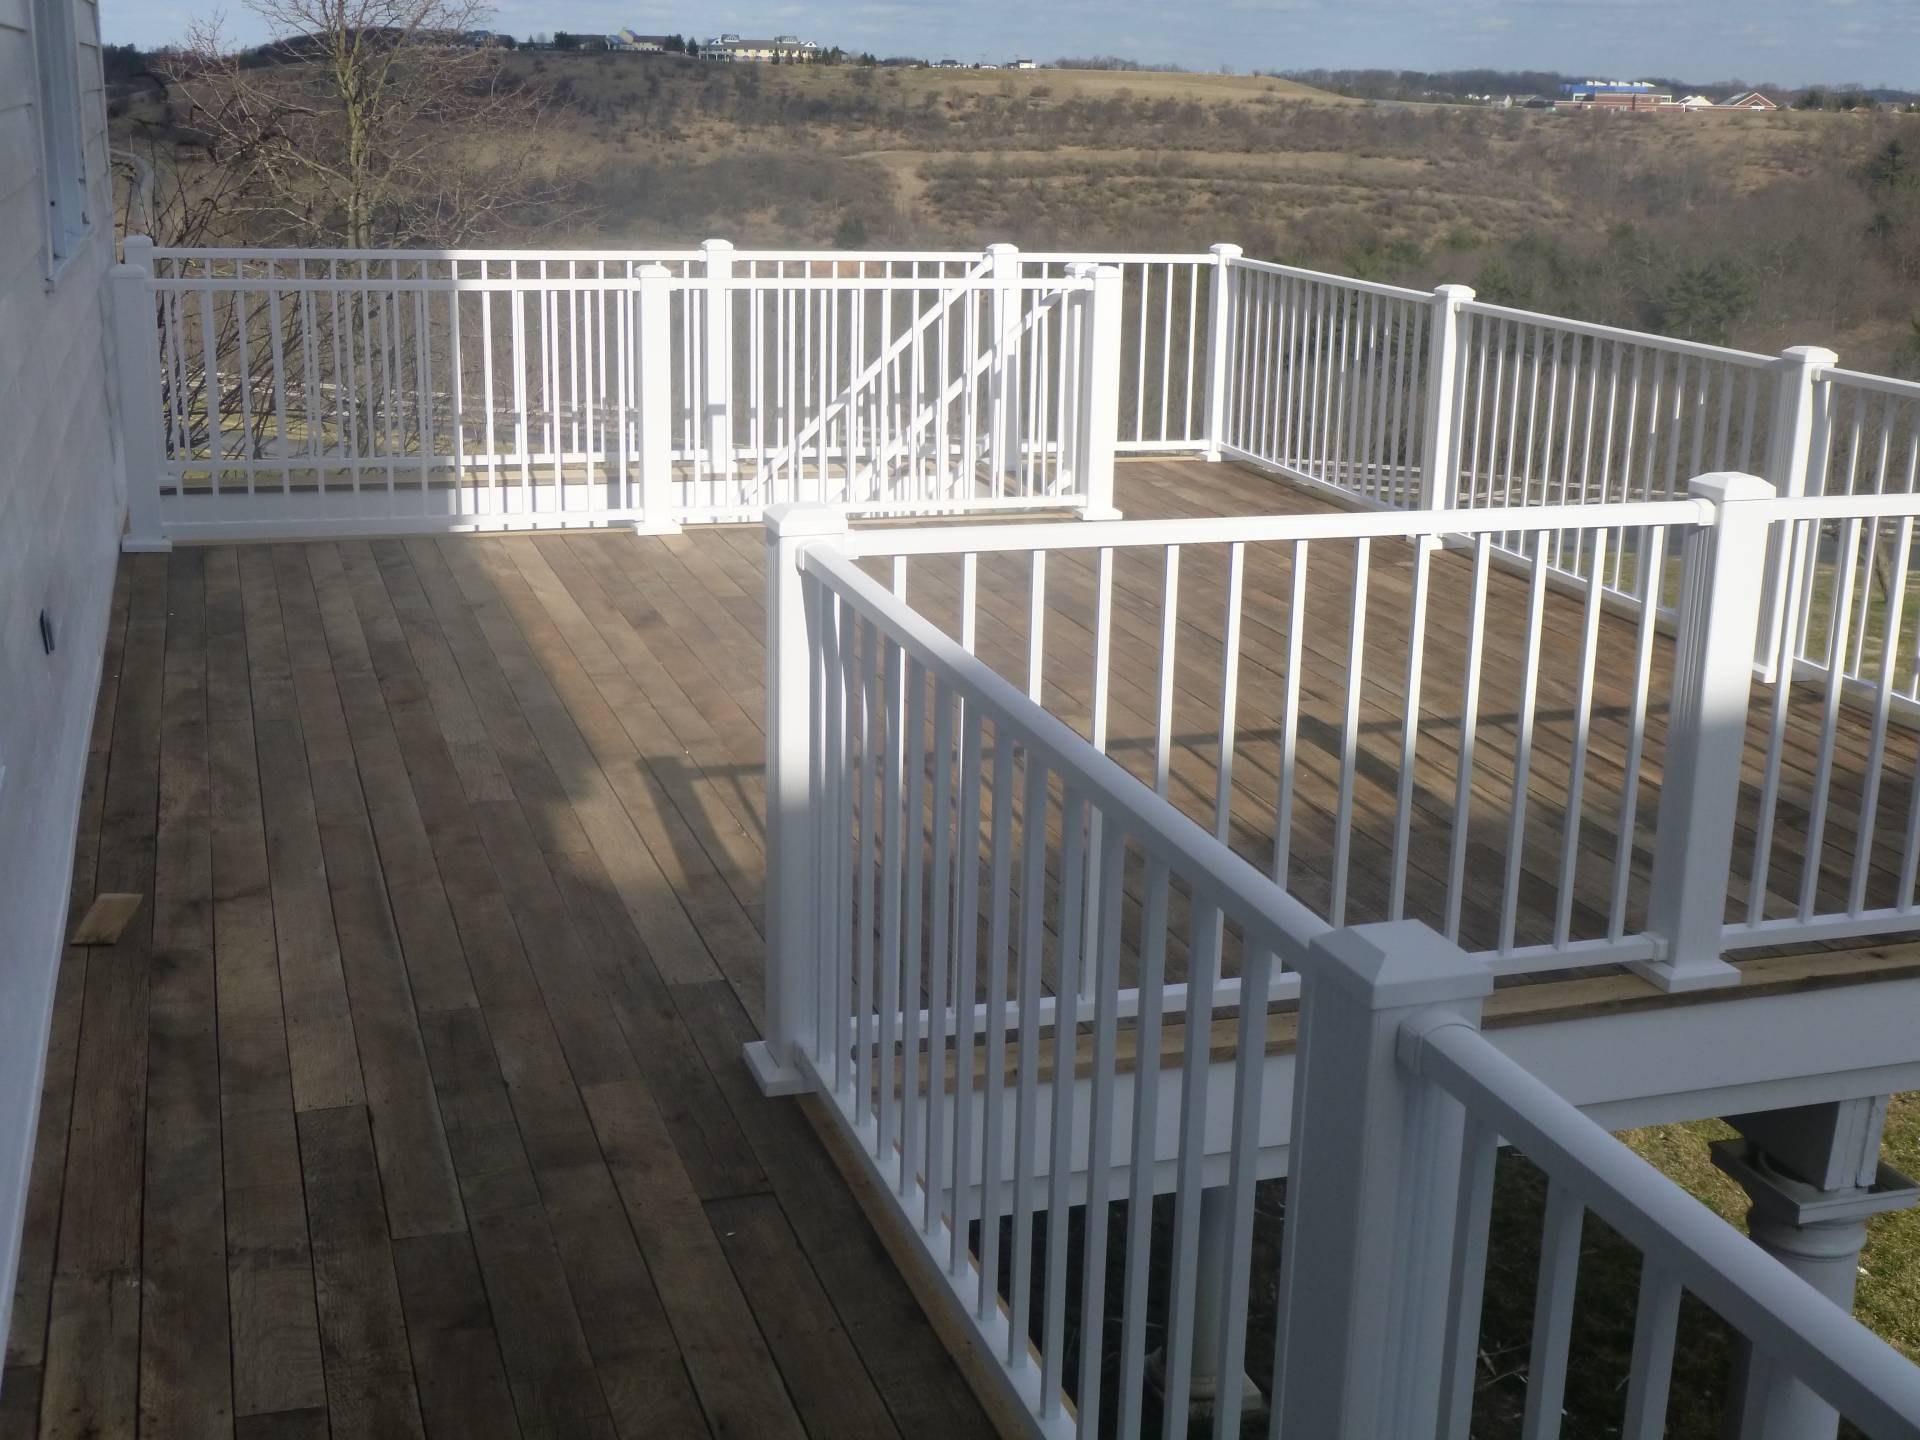 Westbury Tuscany C10 C101 Aluminum Railing | Aluminum Railings For Steps | Verandah | Glass Railing | Pipe | Indoor | Glass Panel Wooden Handrail